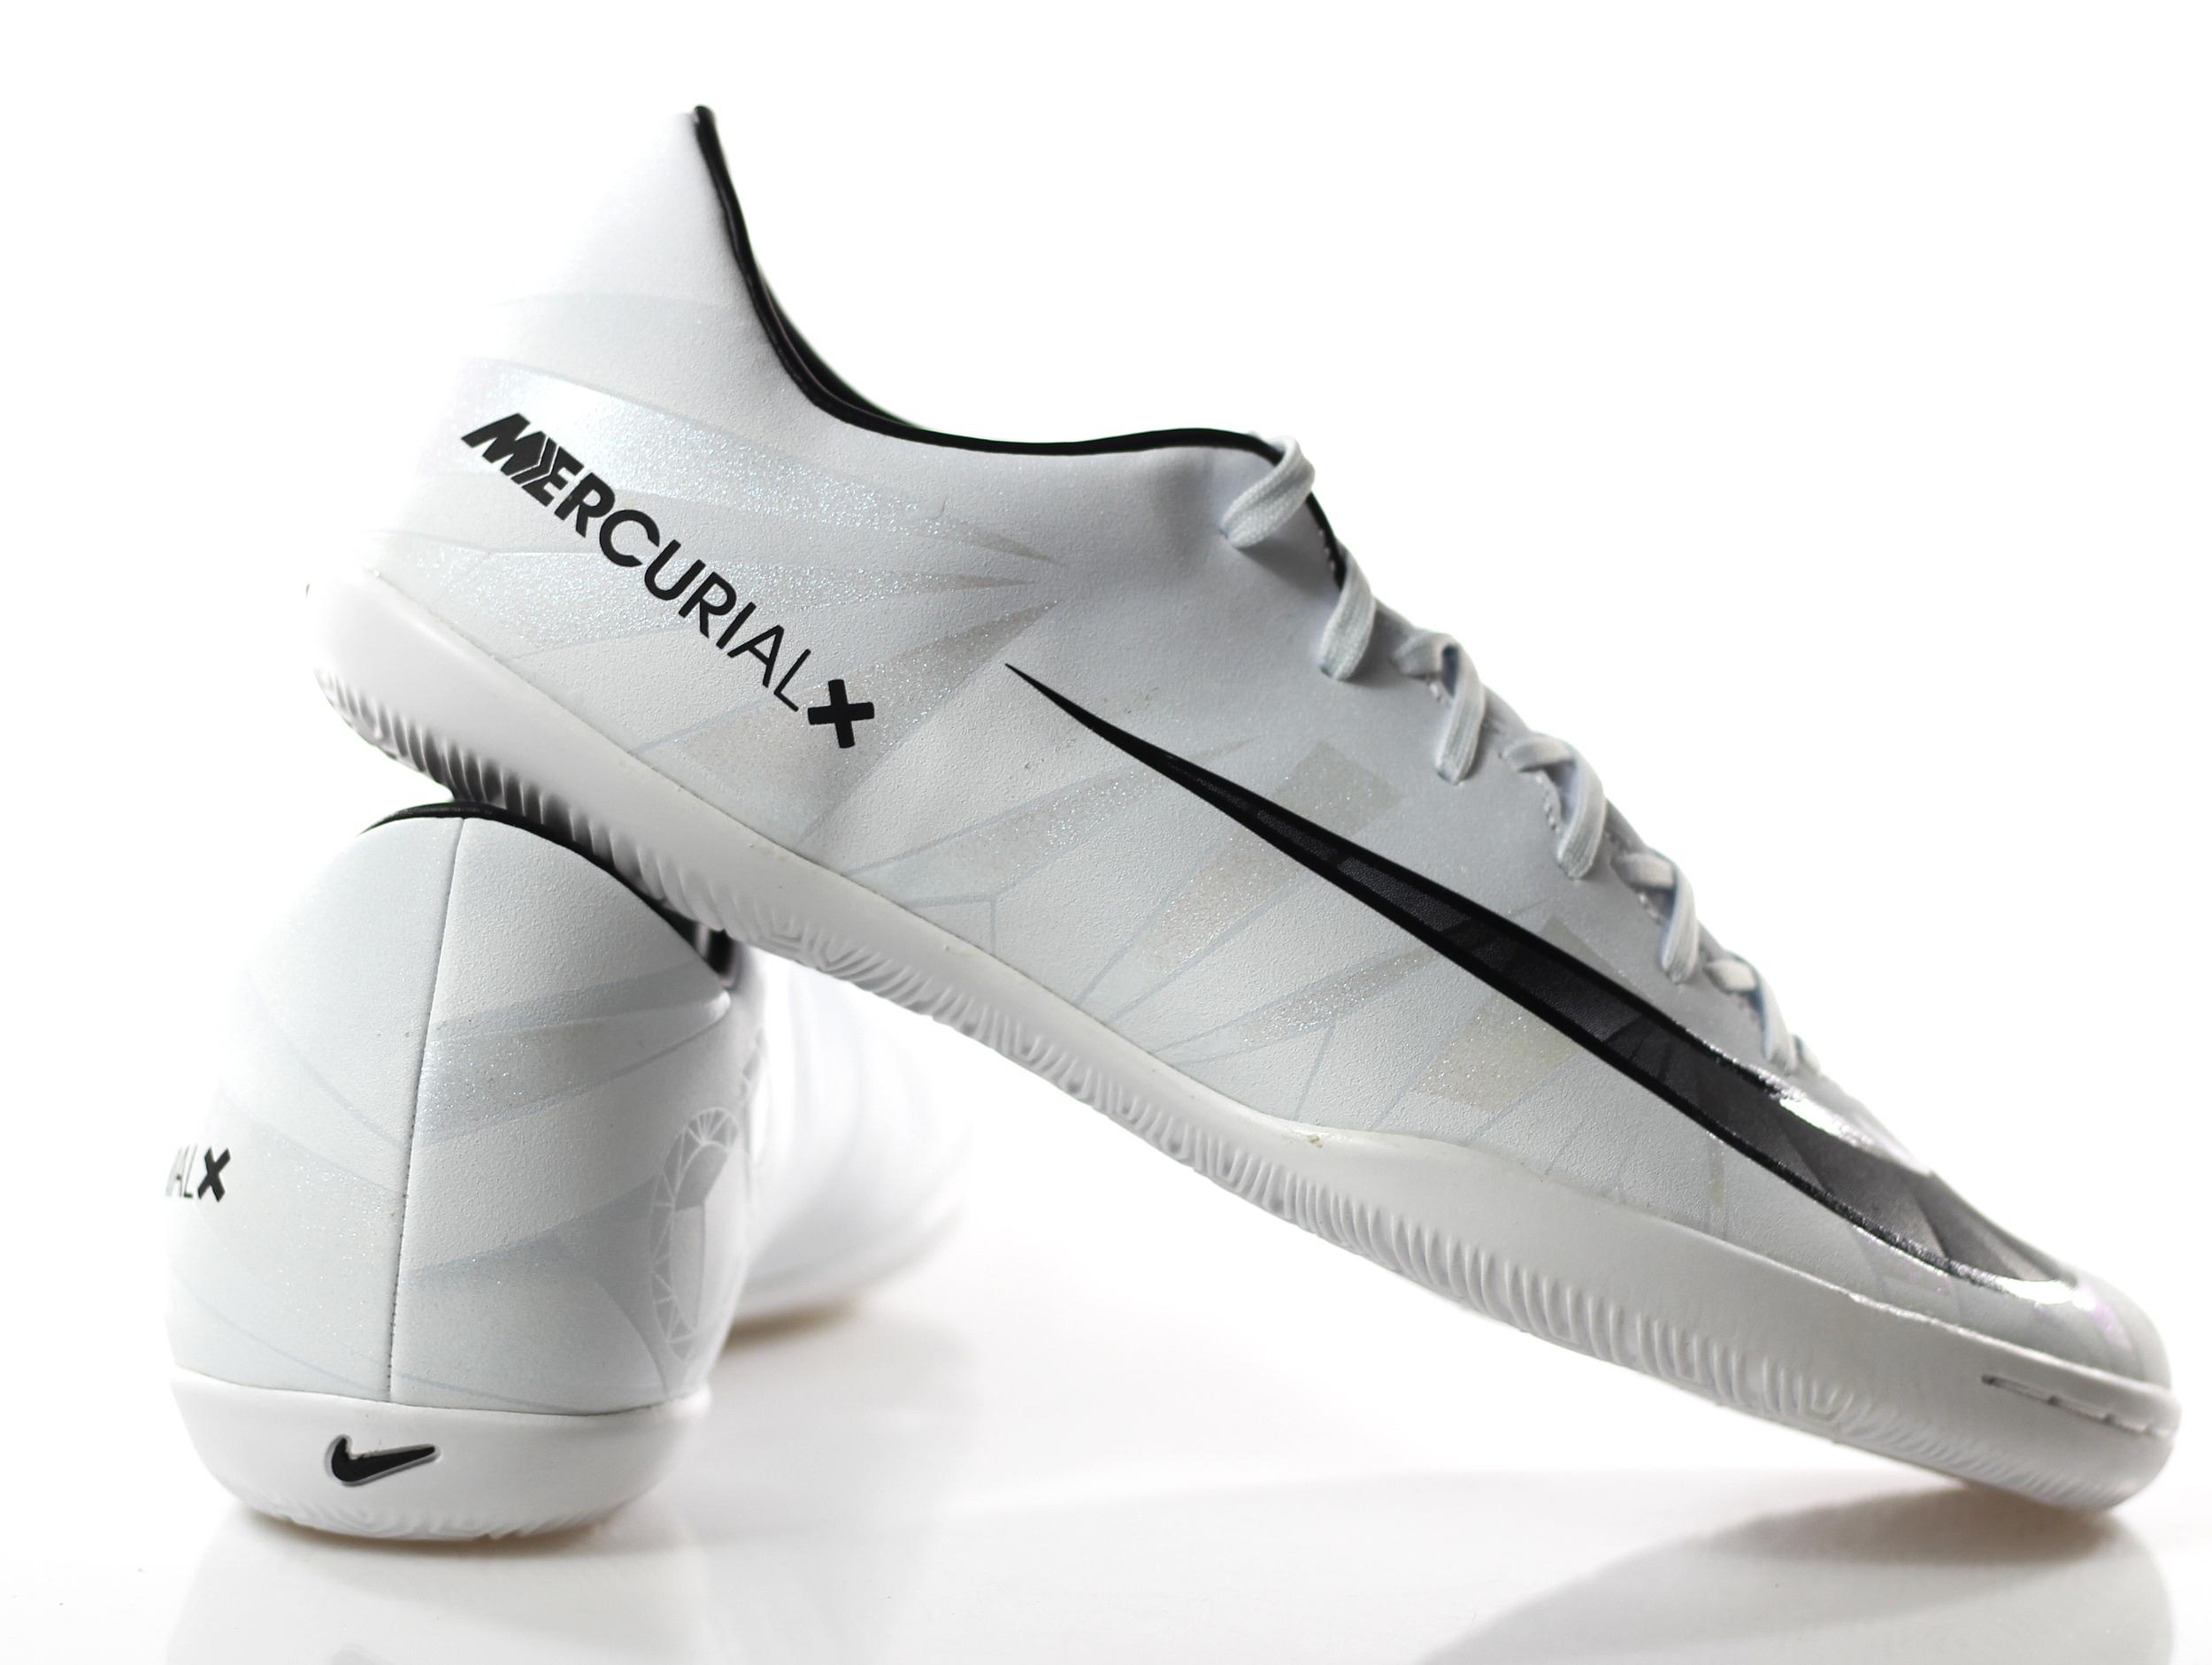 eleganckie buty kupić ujęcia stóp BUTY NIKE MERCURIAL VICTORY IC CR7 HALA 401 R.44,5 ...